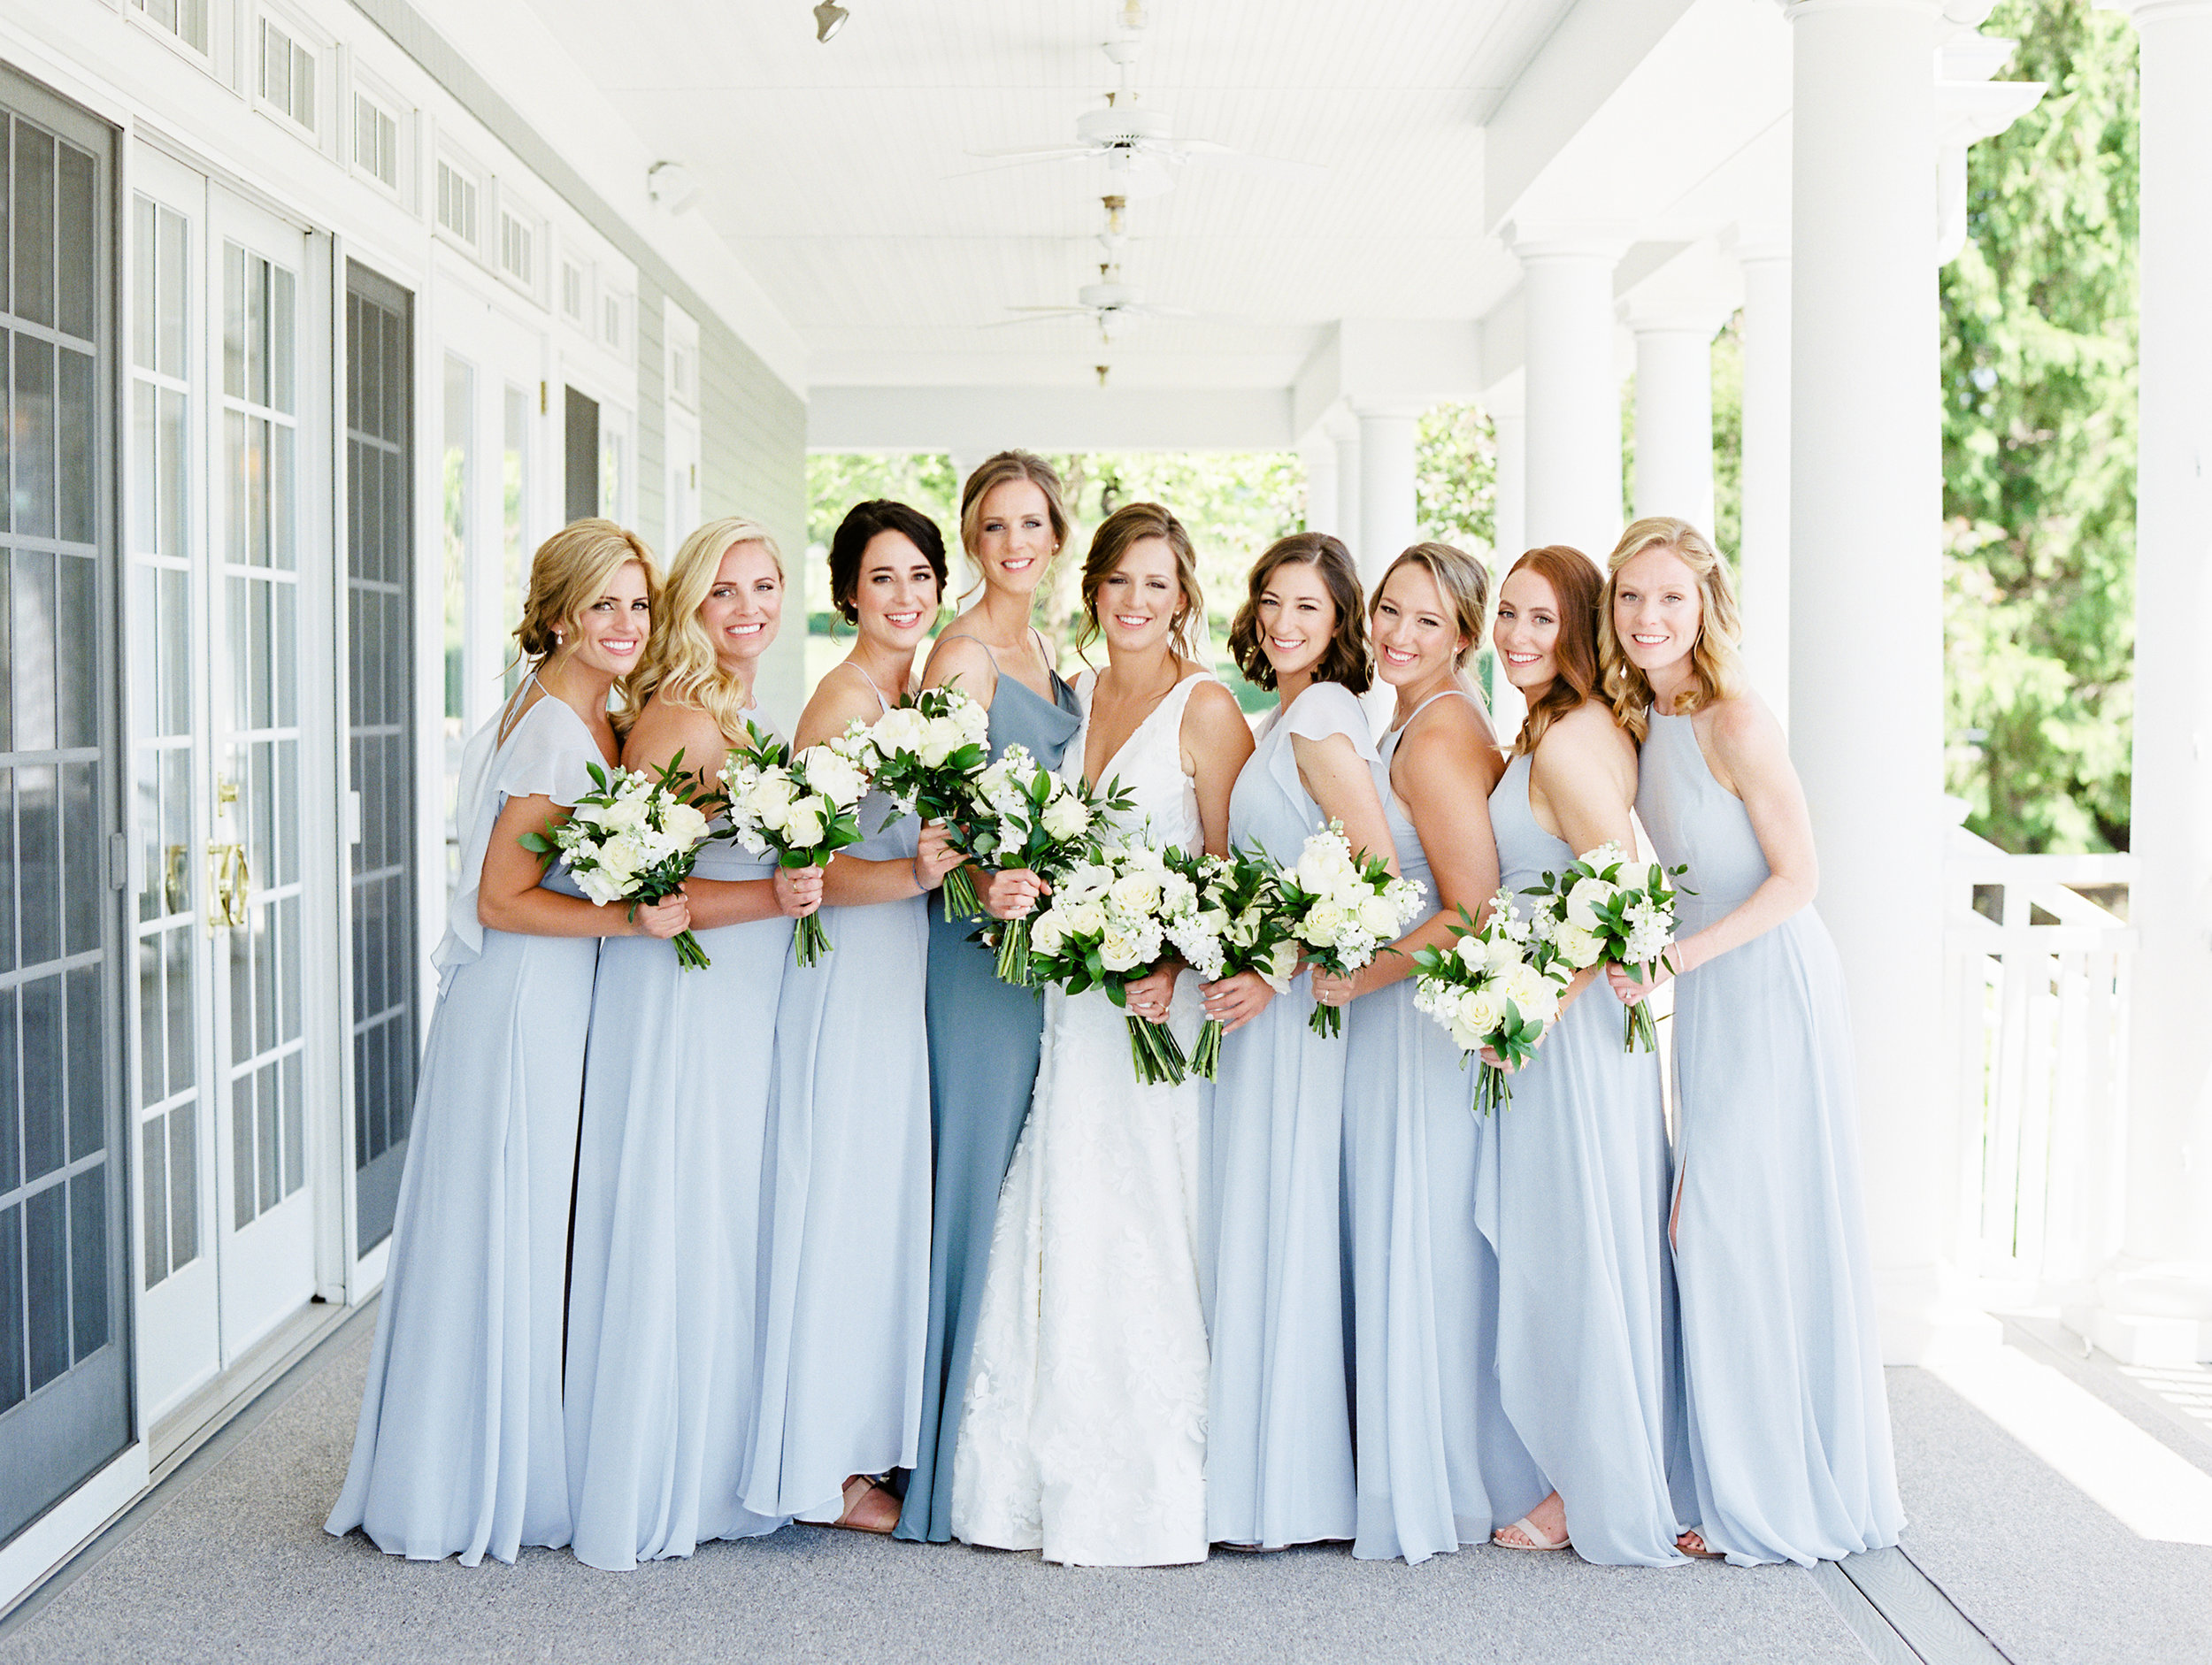 DeGuilio+Wedding+Bridal+Partyf-15.jpg